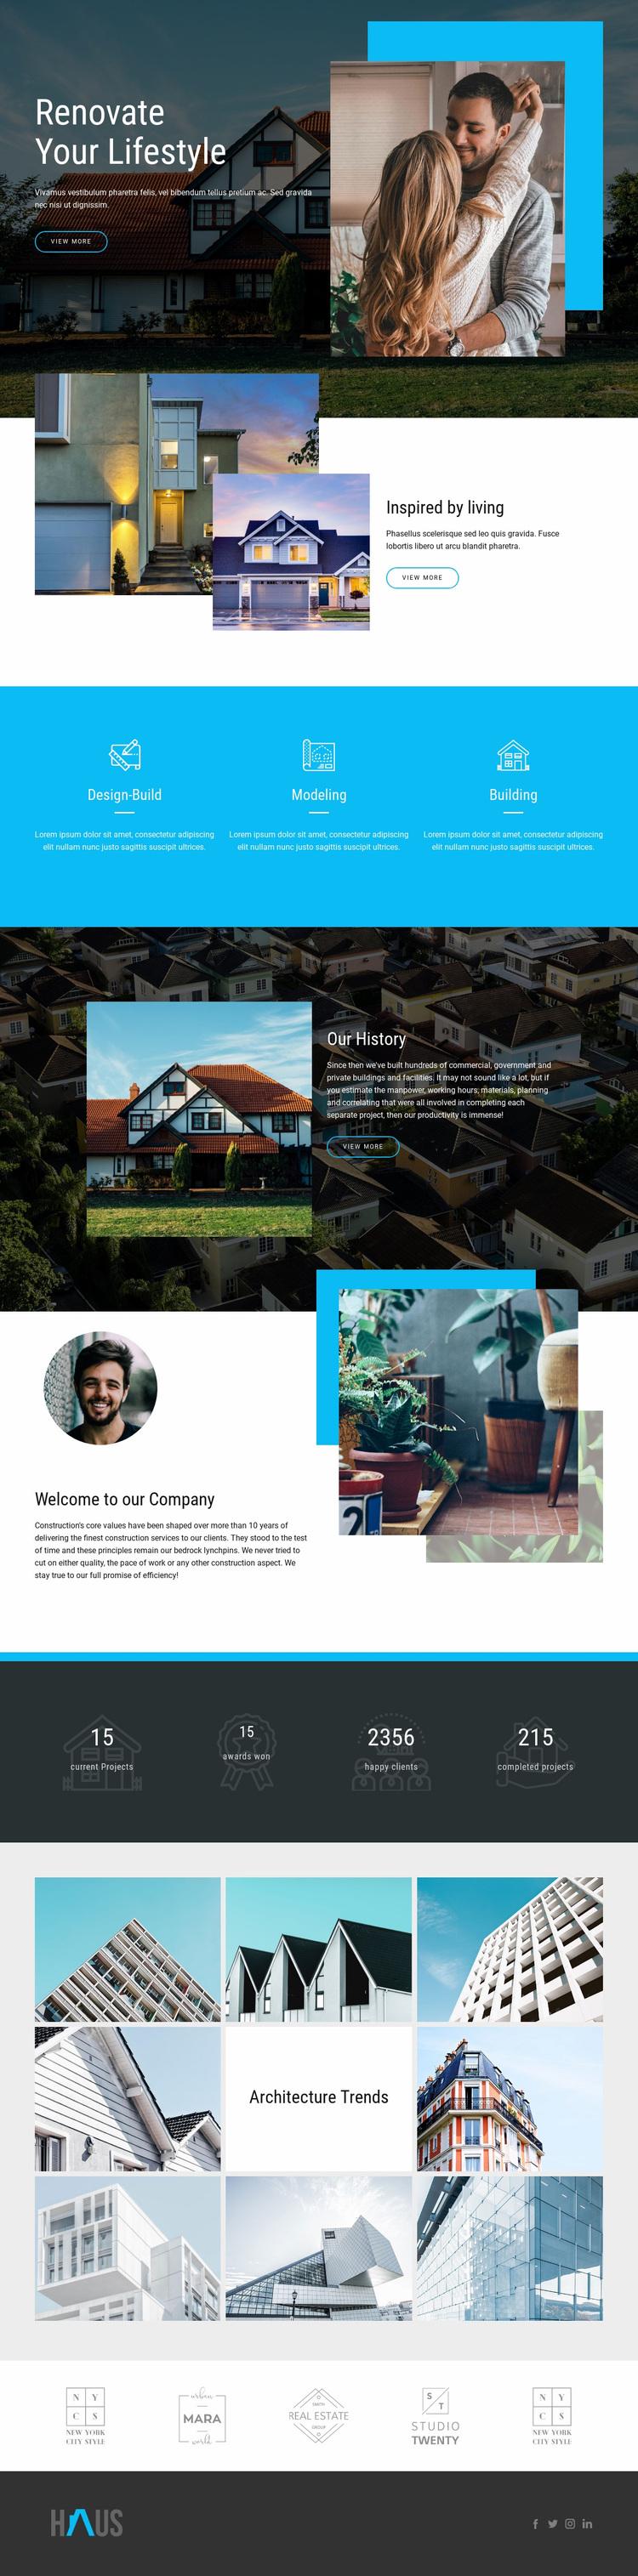 Renovate real estate Web Page Designer